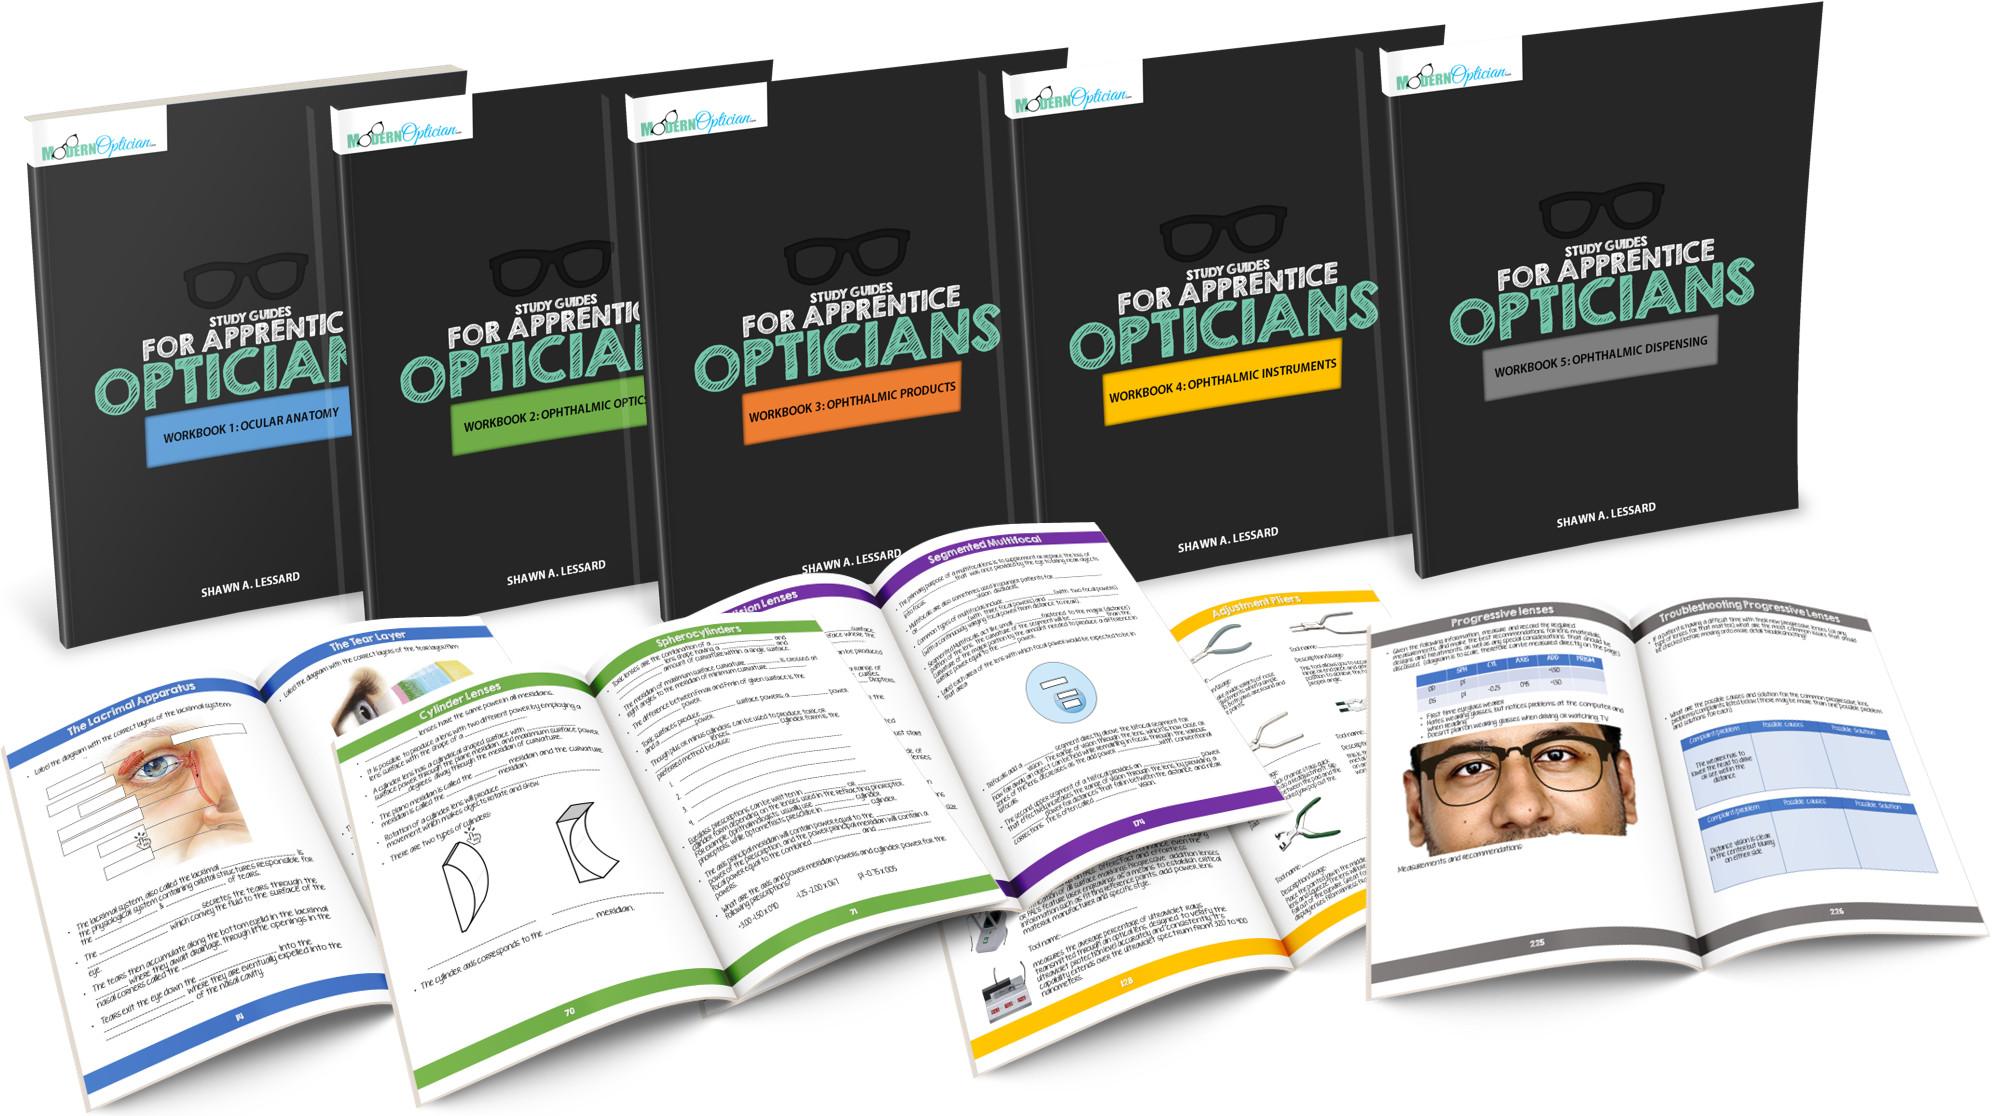 workbooks for apprentice opticians